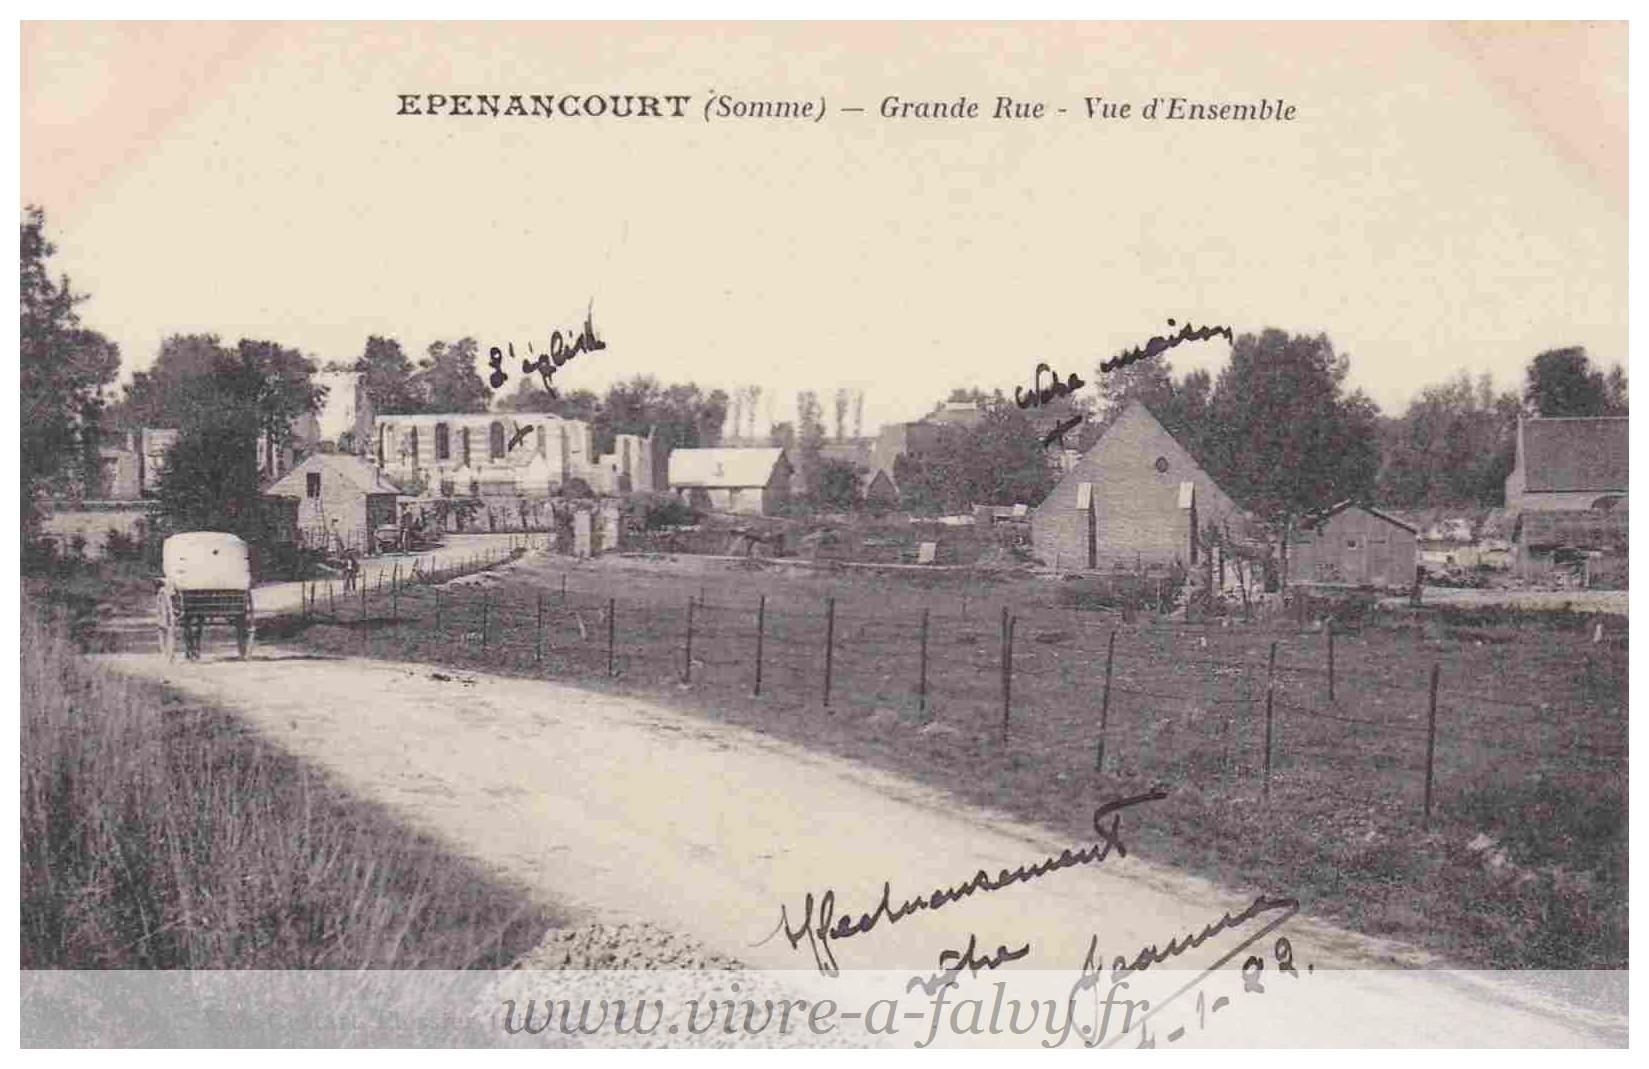 Epenancourt - Grande Rue